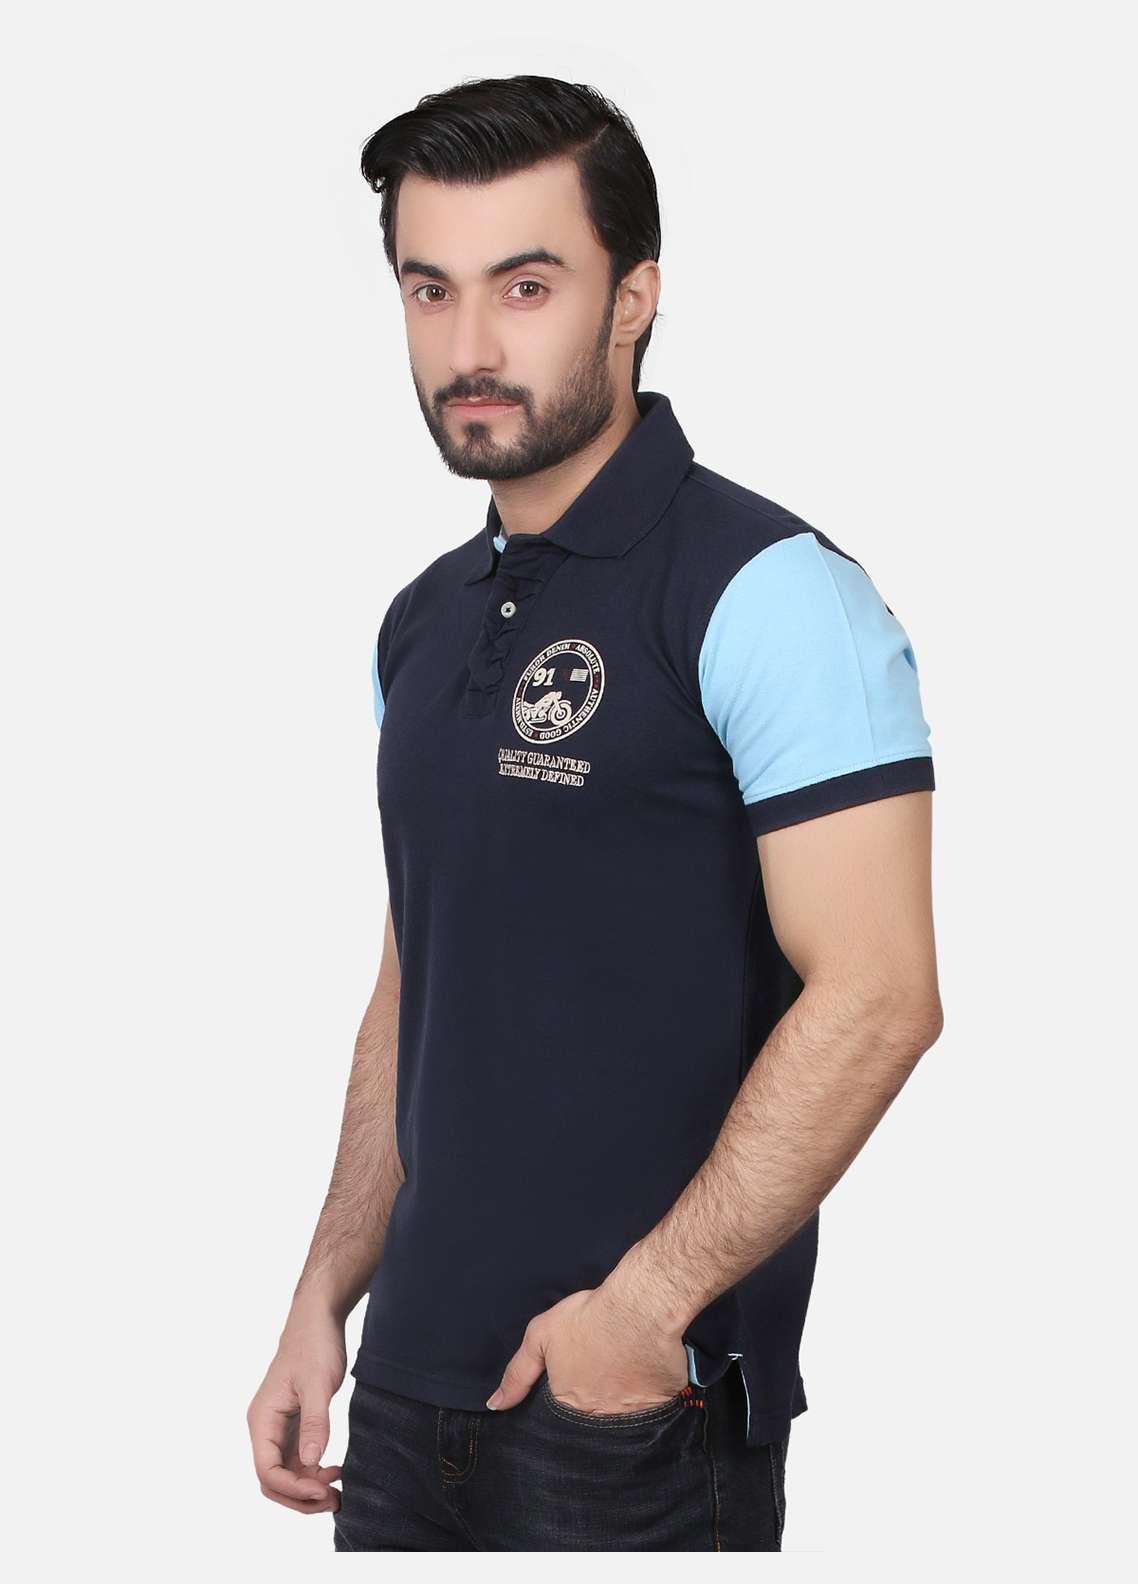 Furor Cotton Polo Men T-Shirts - Navy Blue FRM18PS 021